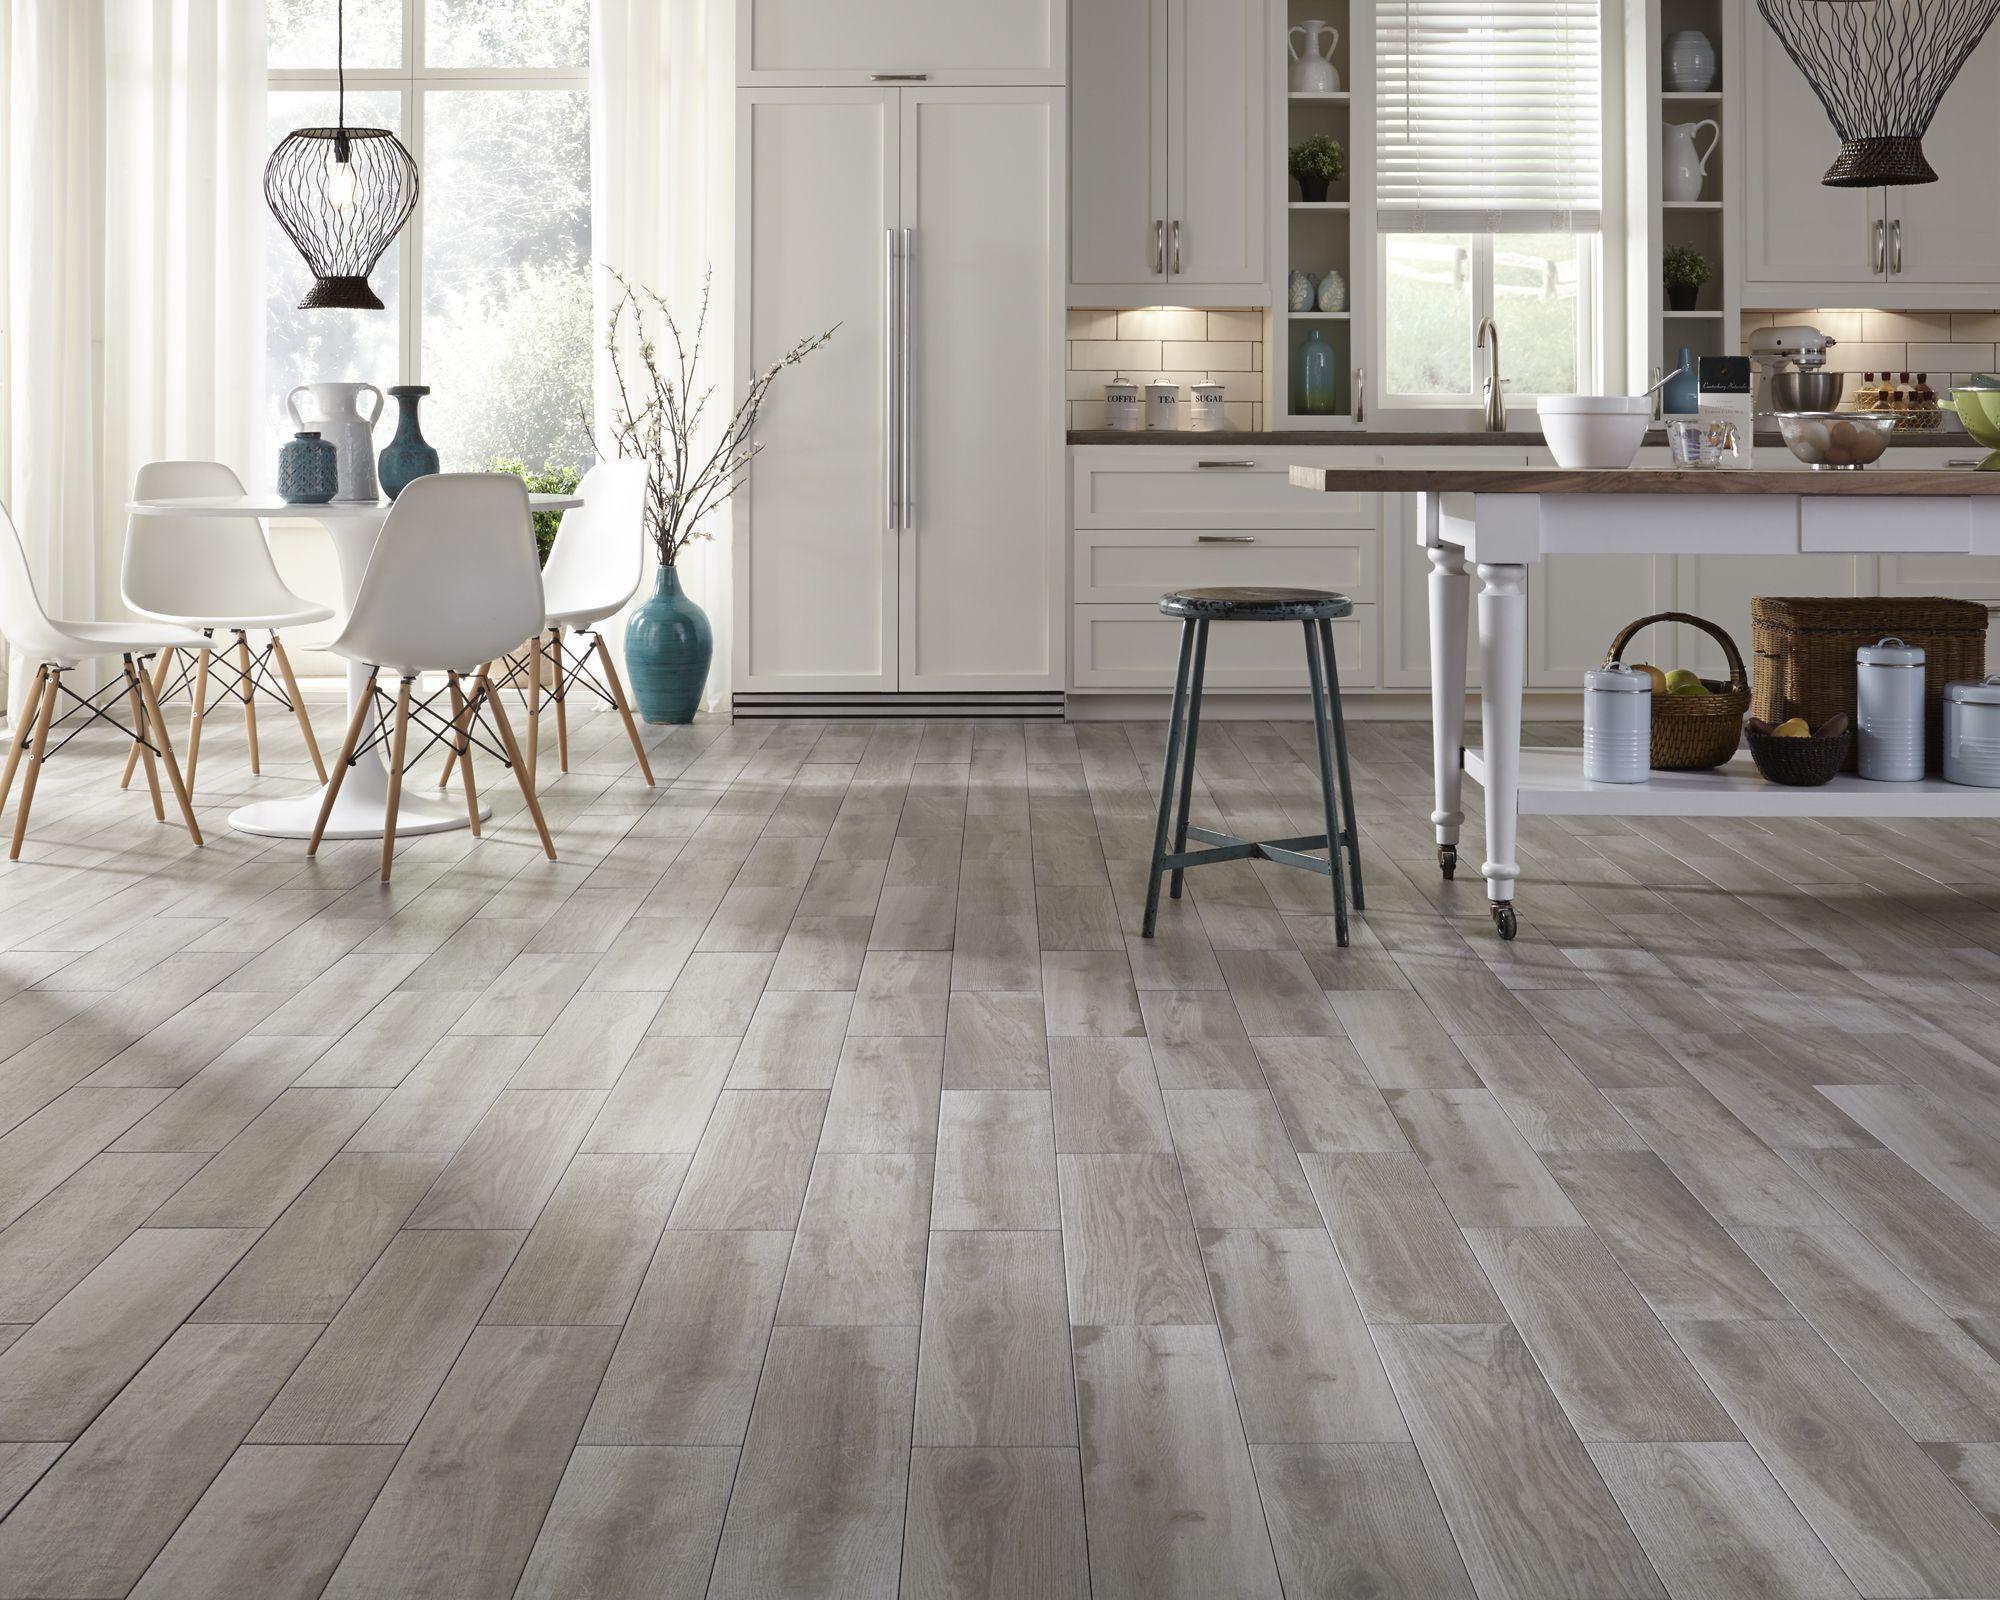 2015 Fall Flooring Trends Gray Wood Tile Flooring House